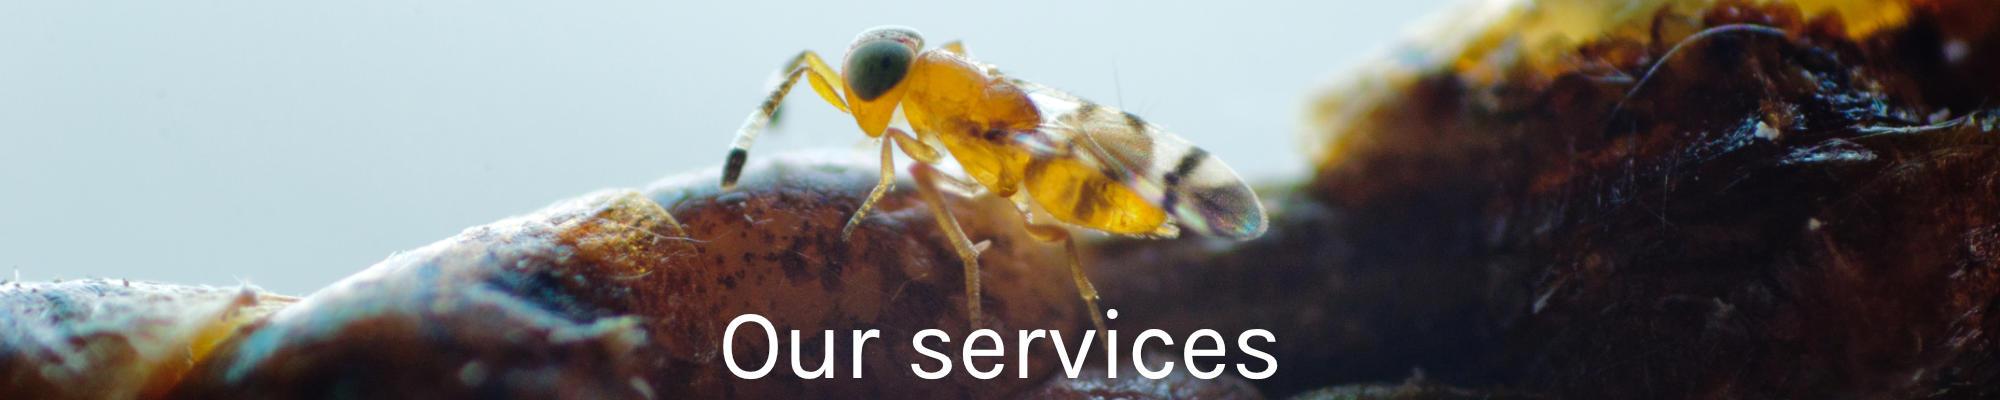 Onze services banner EN 2000x400